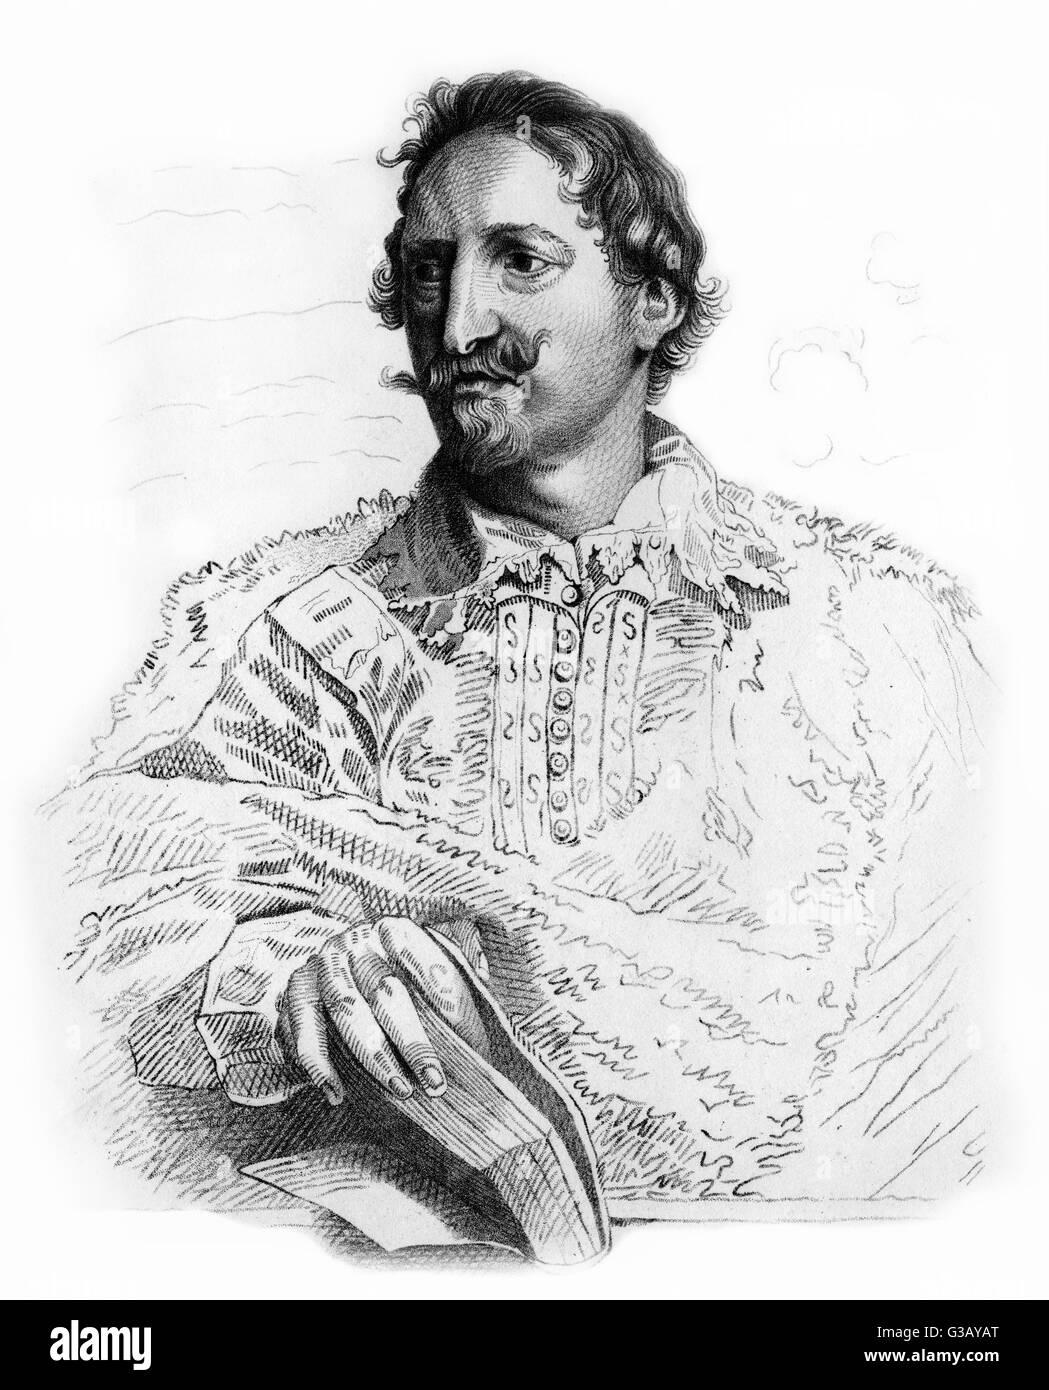 JAN CASPAR GEVARTIUS  Flemish jurist        Date: 1593 - 1666 - Stock Image